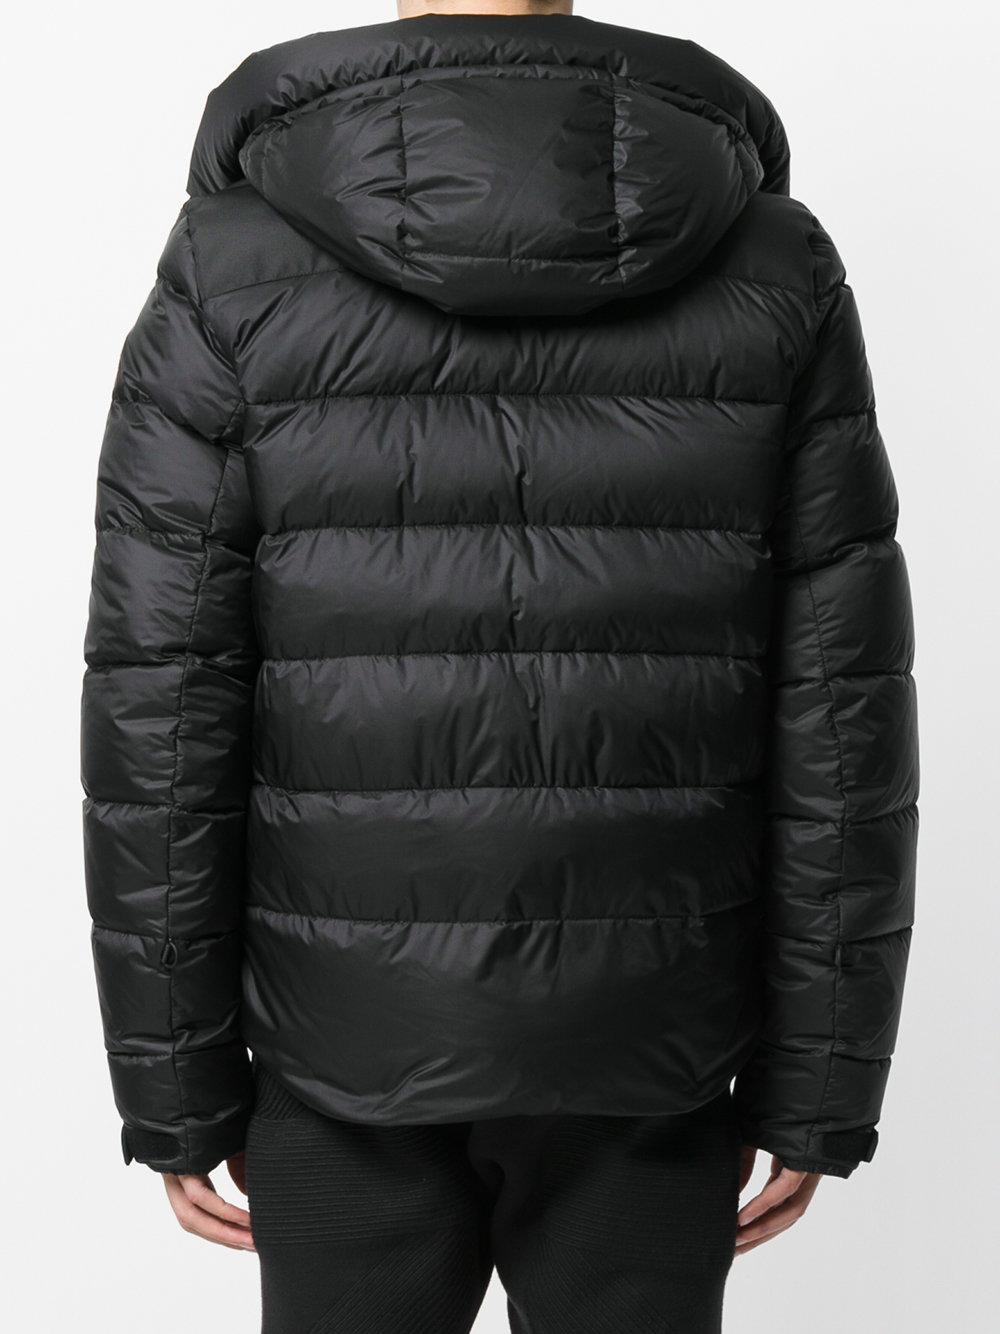 3 MONCLER GRENOBLE Synthetic Camurac Winter Jacket in Black for Men